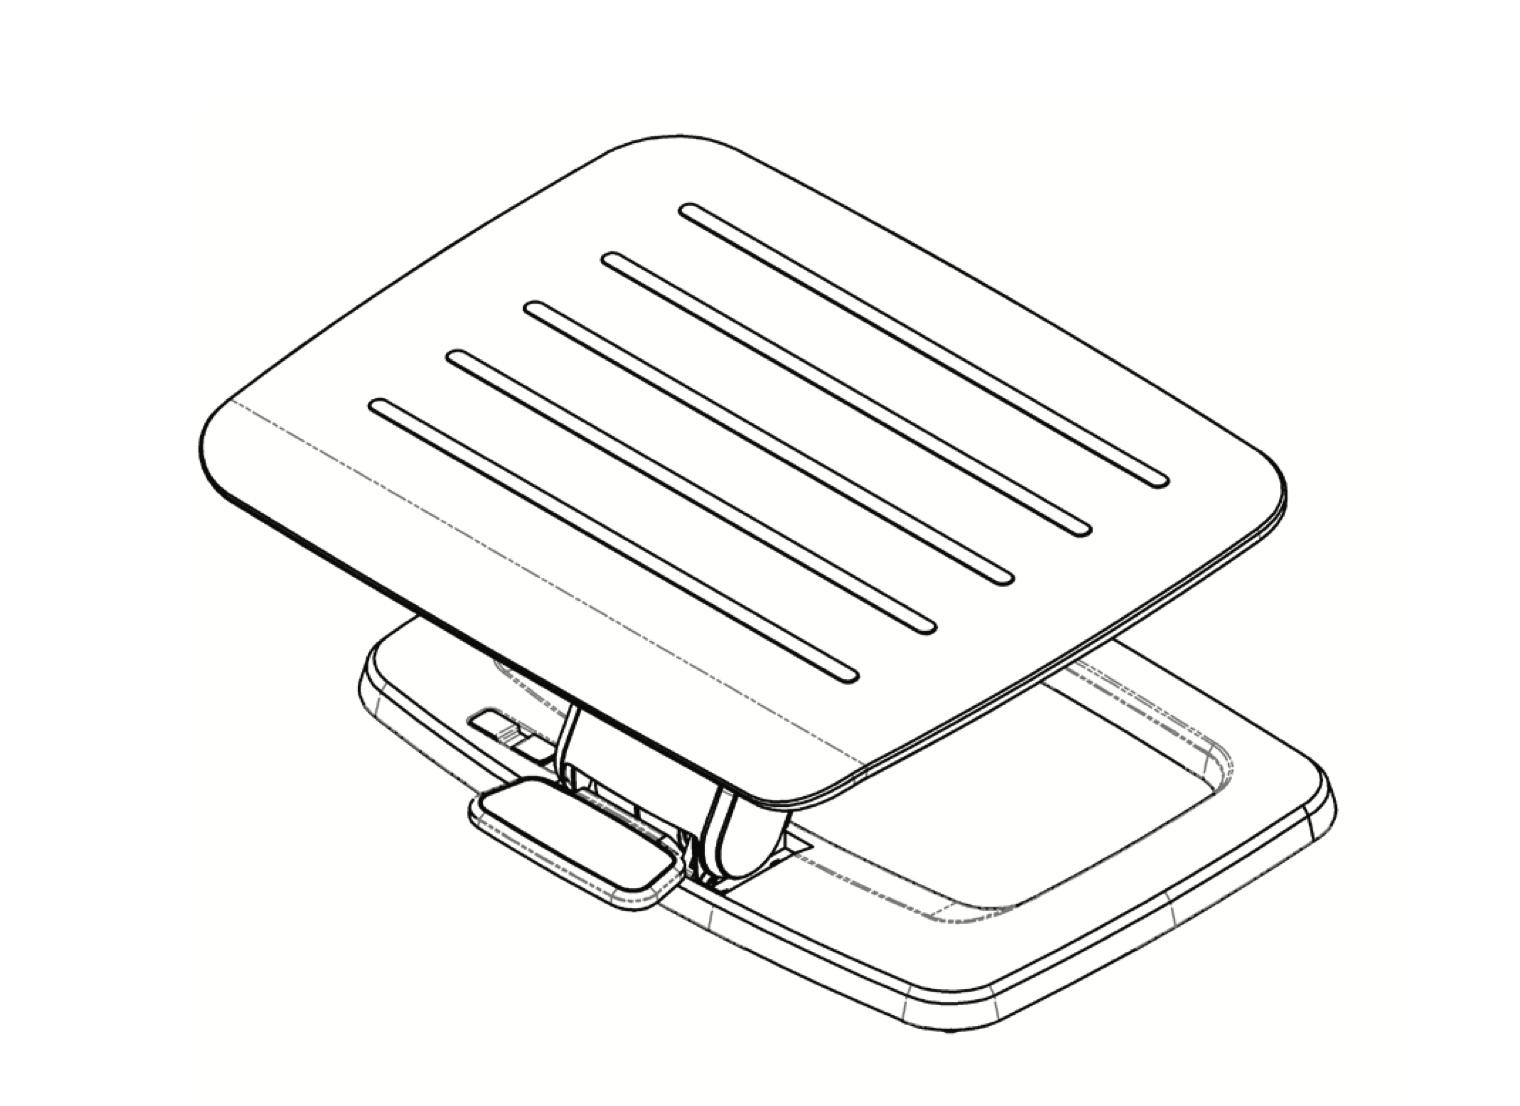 esi hana adjustable foot support line drawing 1